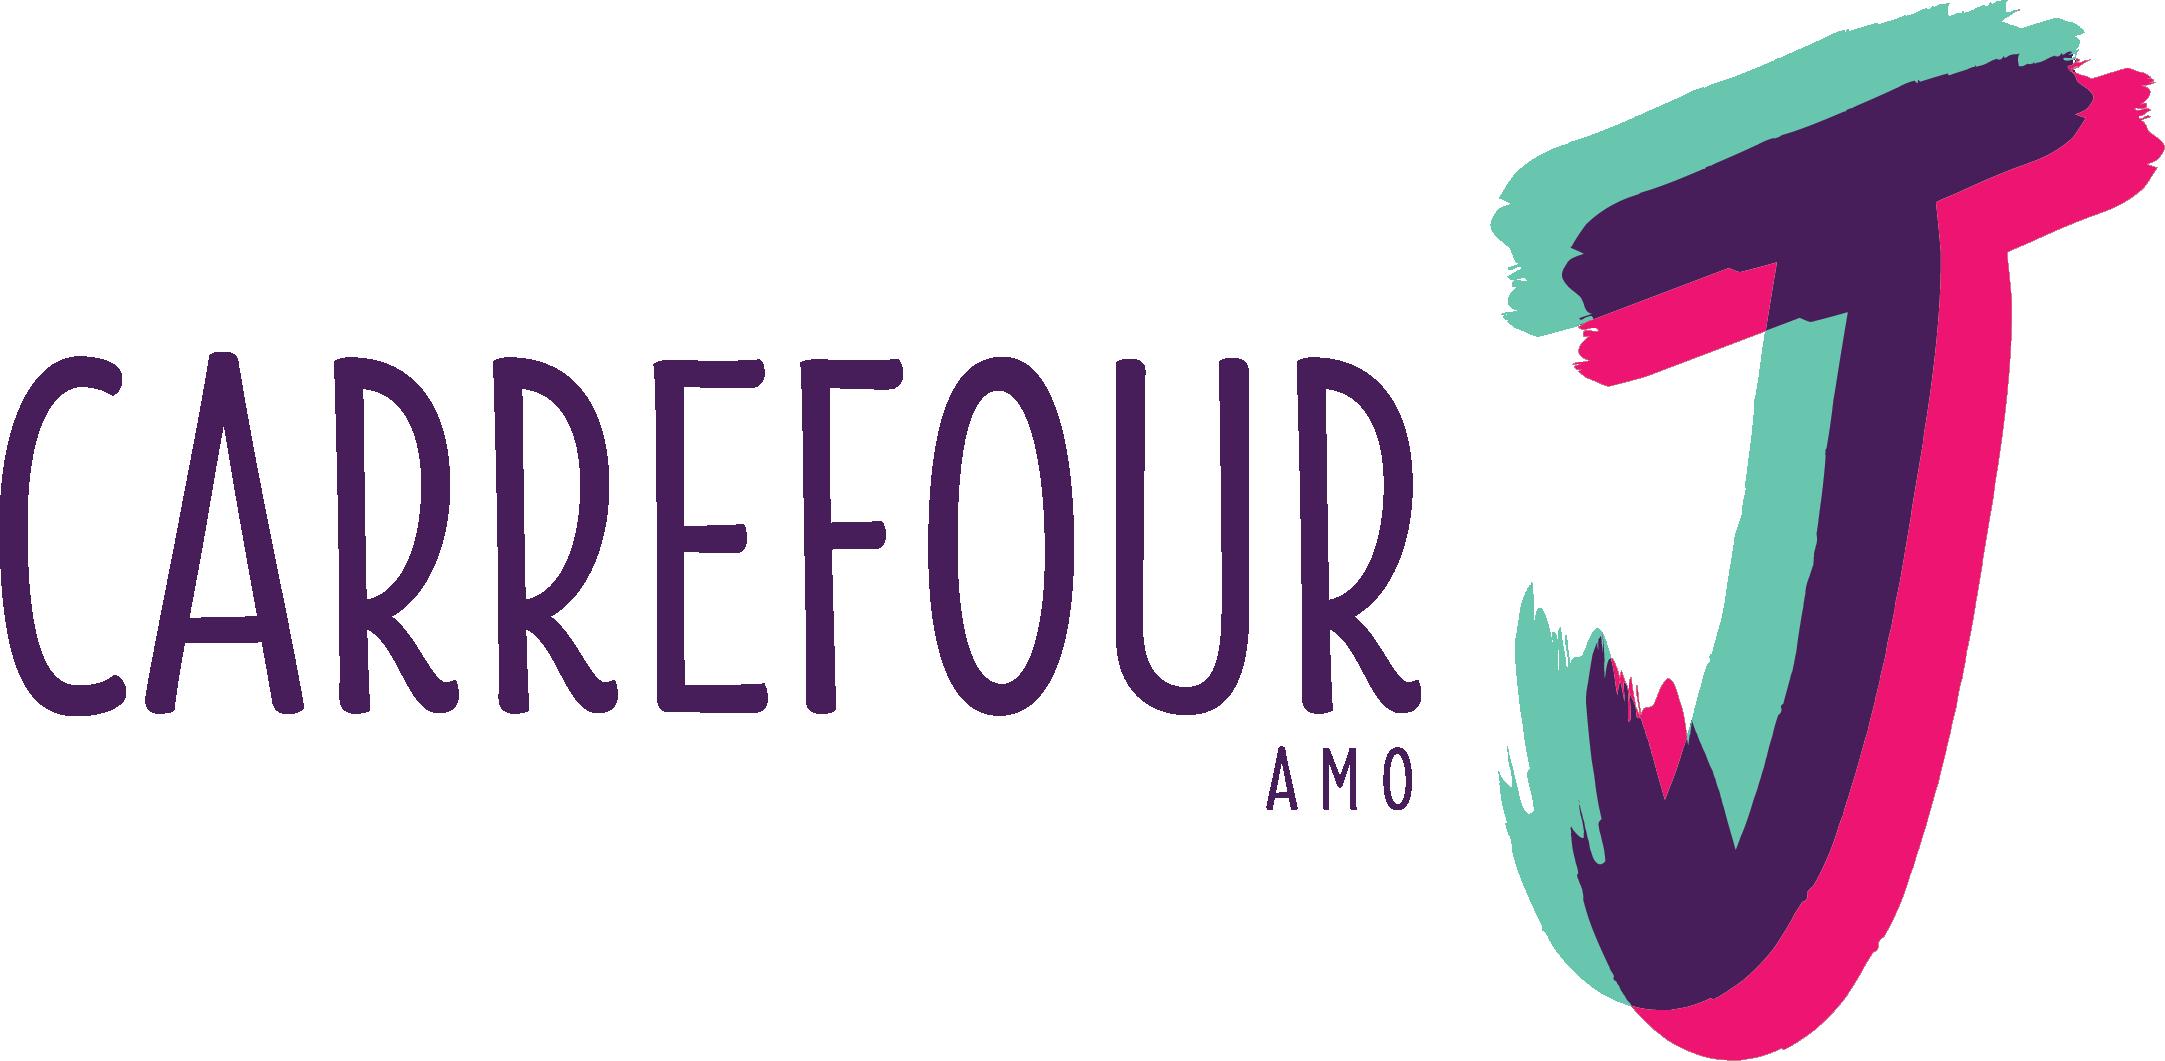 Carrefour J